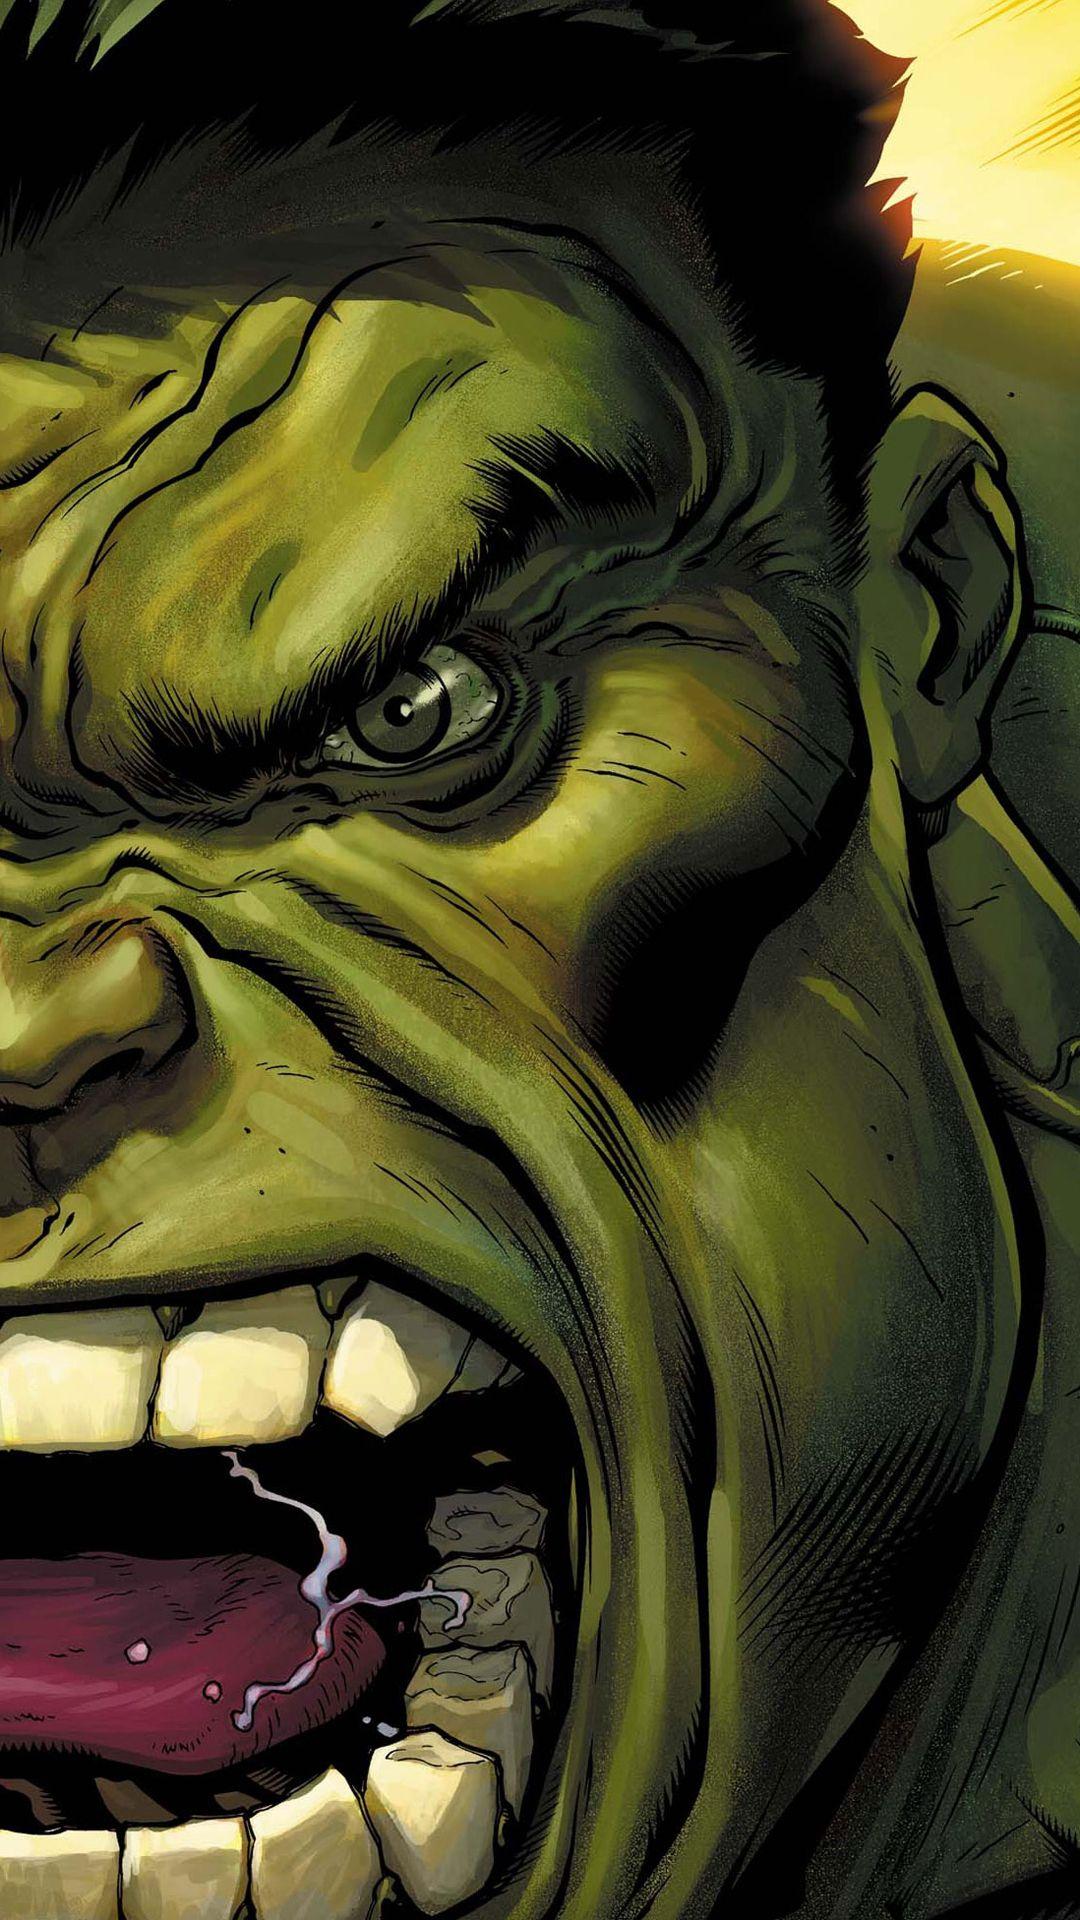 Avengers Hulk Visage Wallpaper